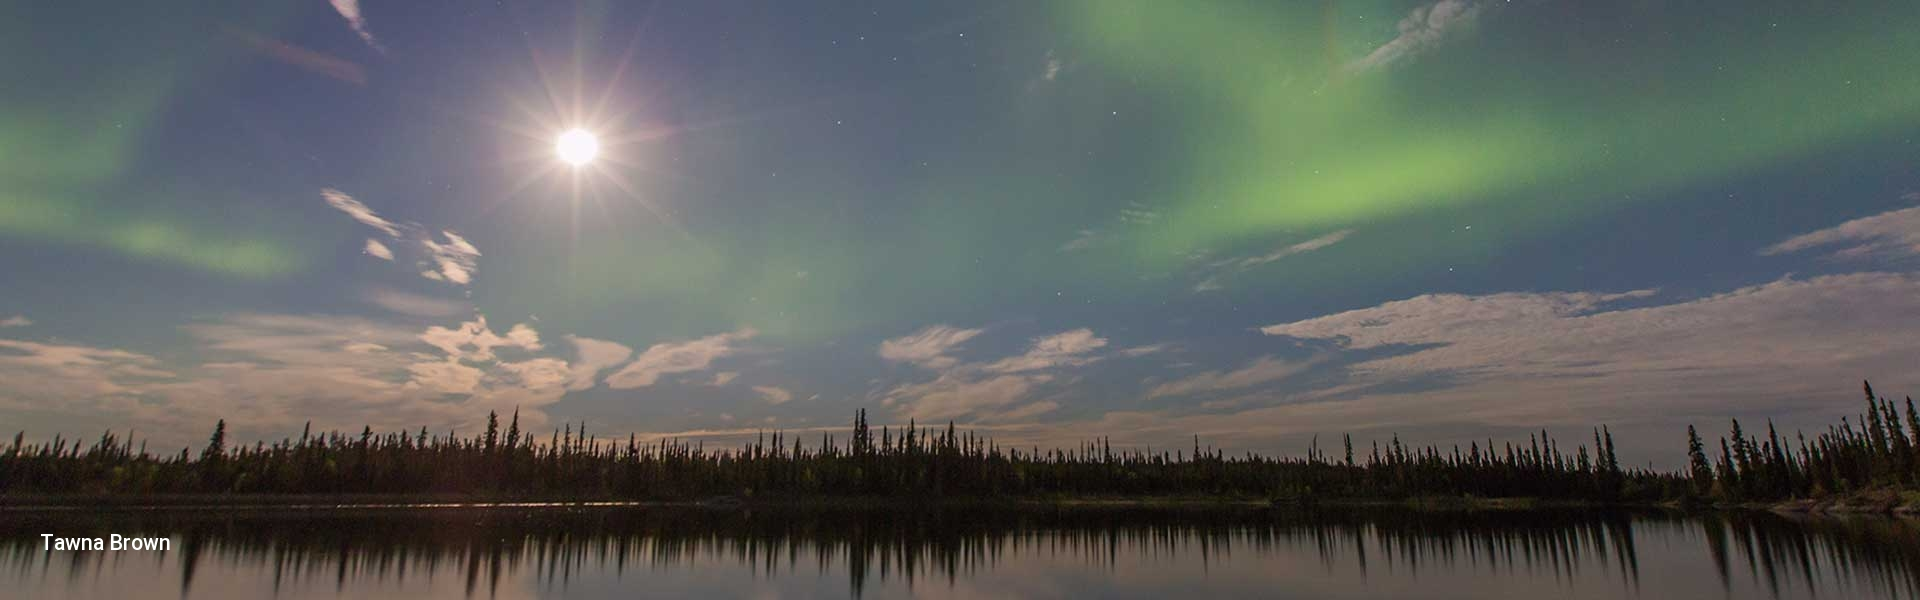 Summer Aurora Borealis in Yellowknife